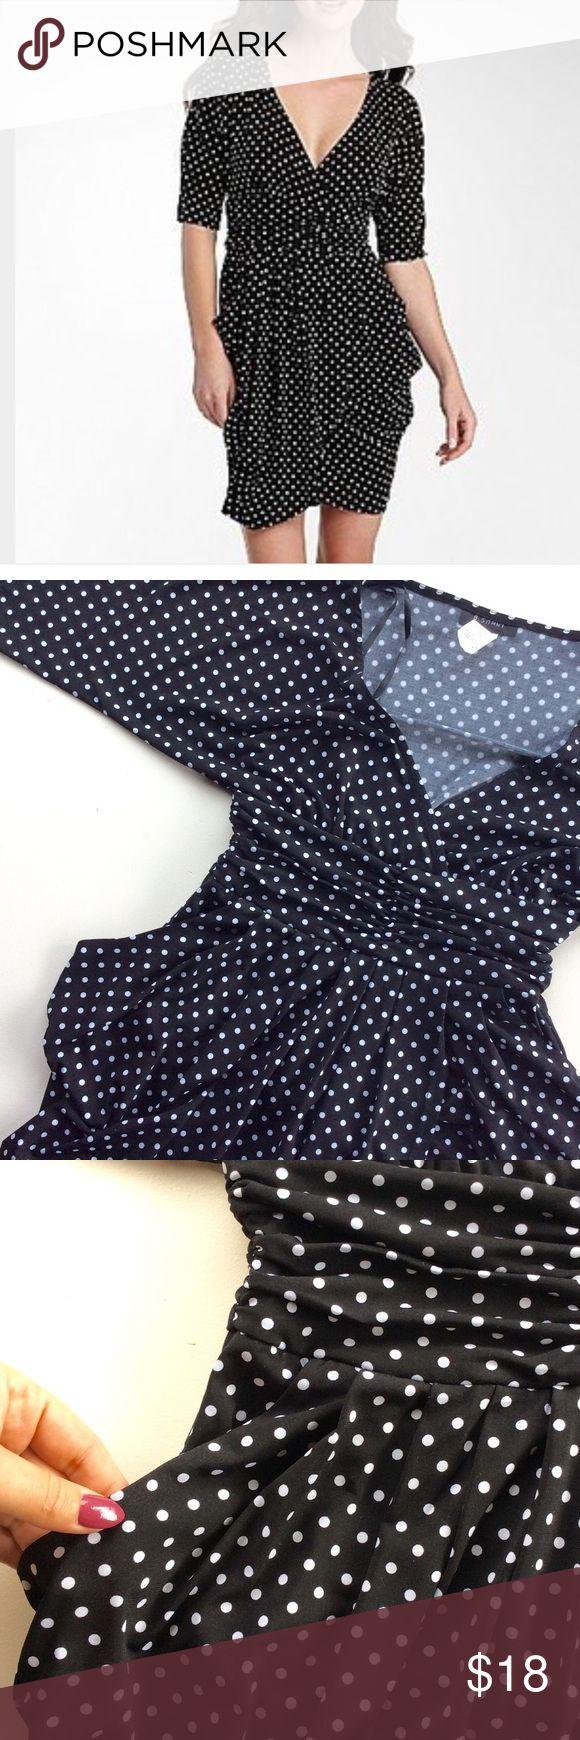 Polka Dots Tulip Dress Beautiful dress, easy to wear, very flattering! B. SMART Dresses